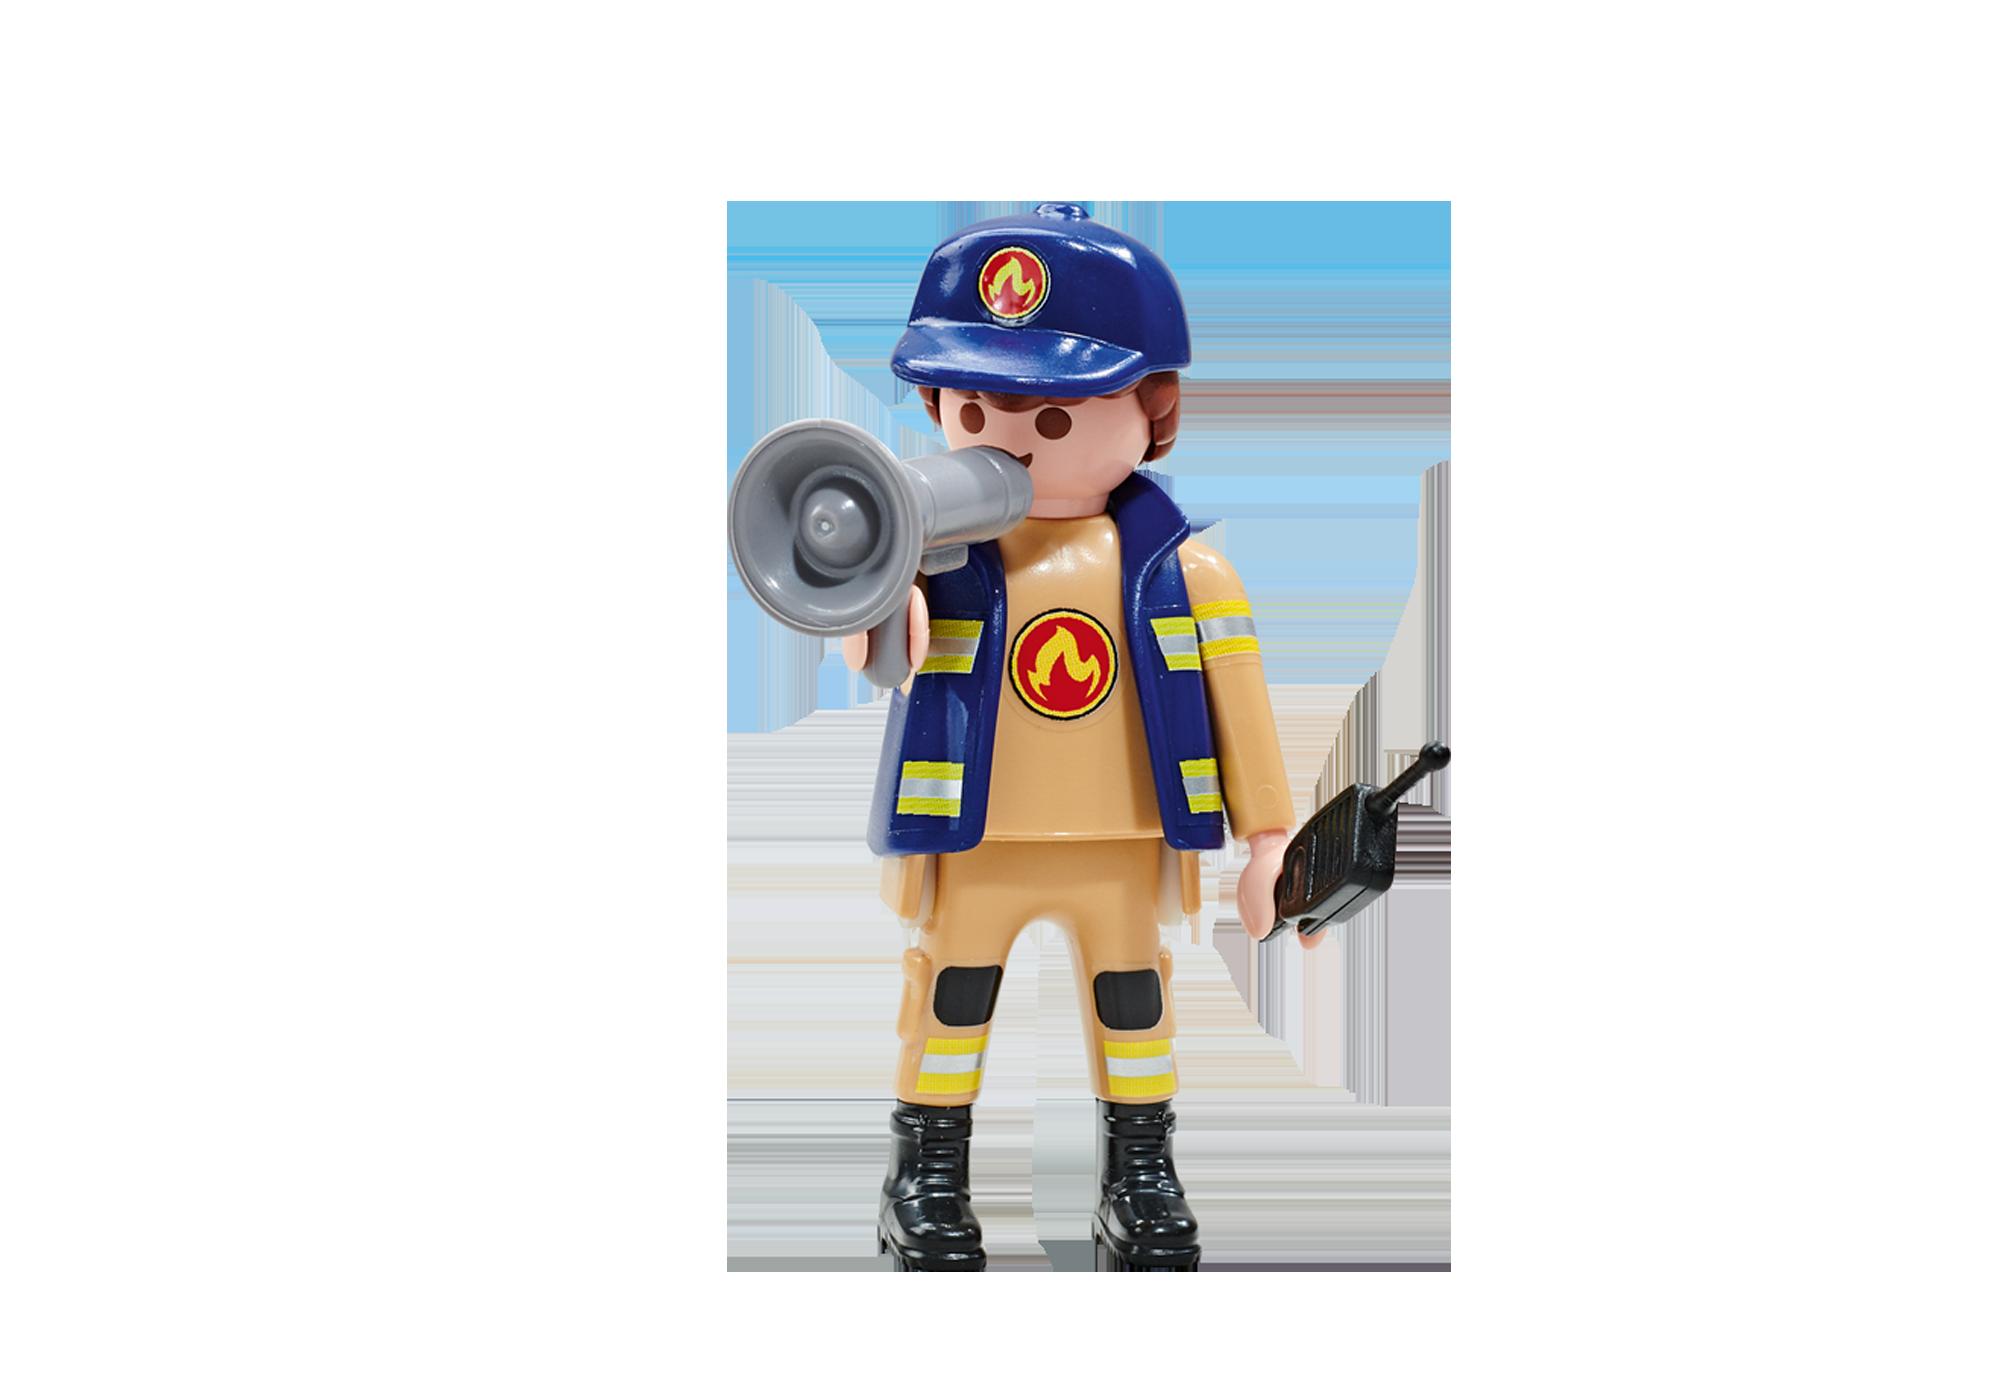 http://media.playmobil.com/i/playmobil/6583_product_detail/Brandweercommandant ploeg A